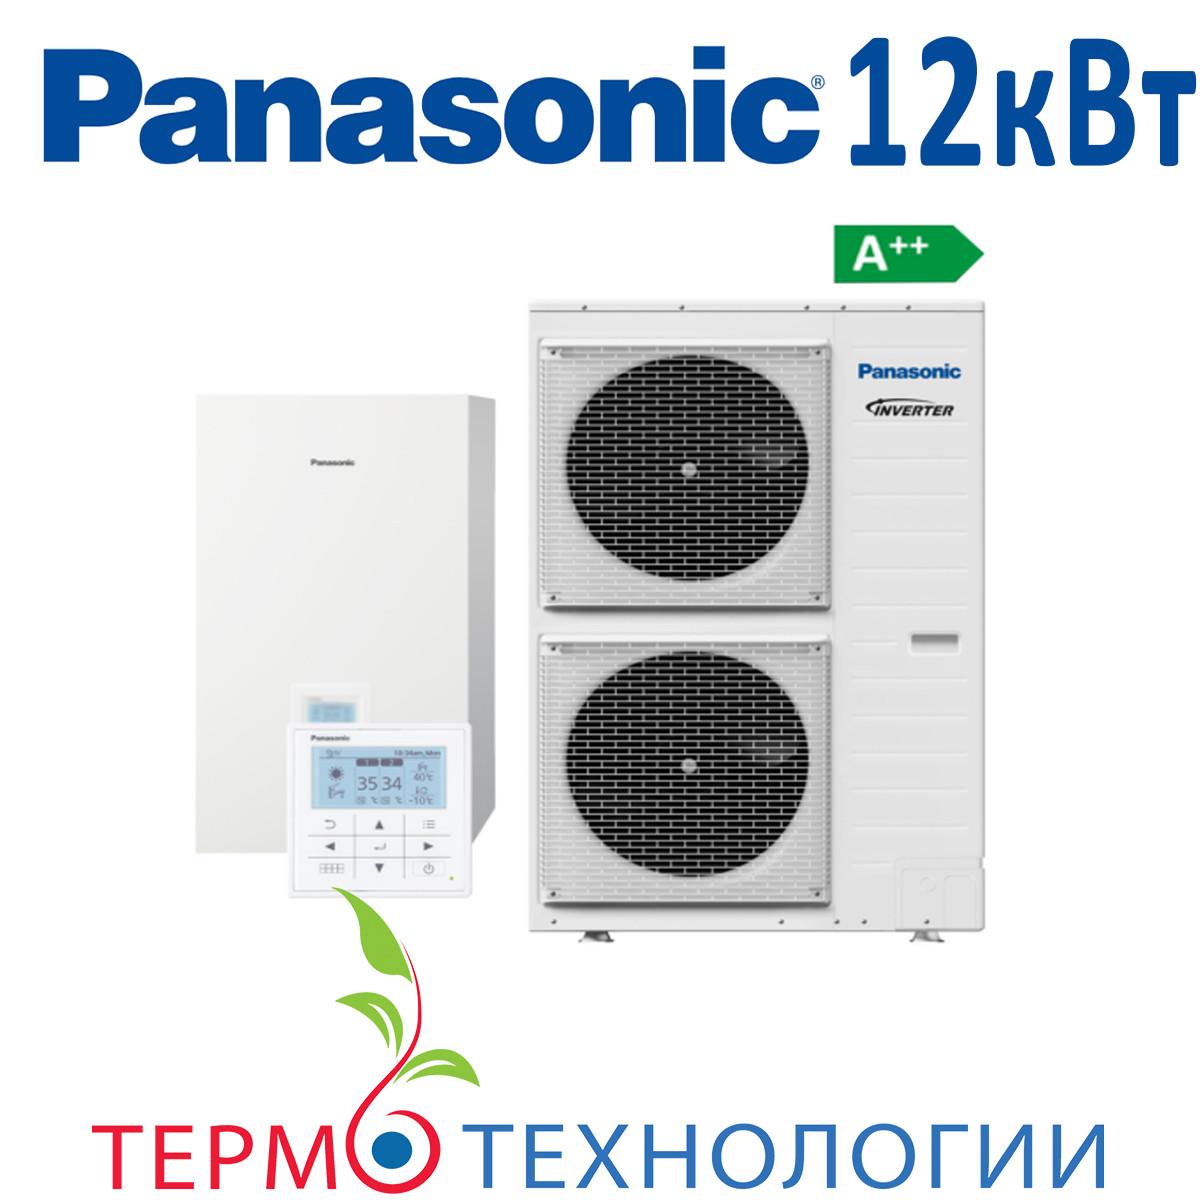 Тепловой насос воздух-вода Panasonic 12 кВт, T-CAP с гидромодулем